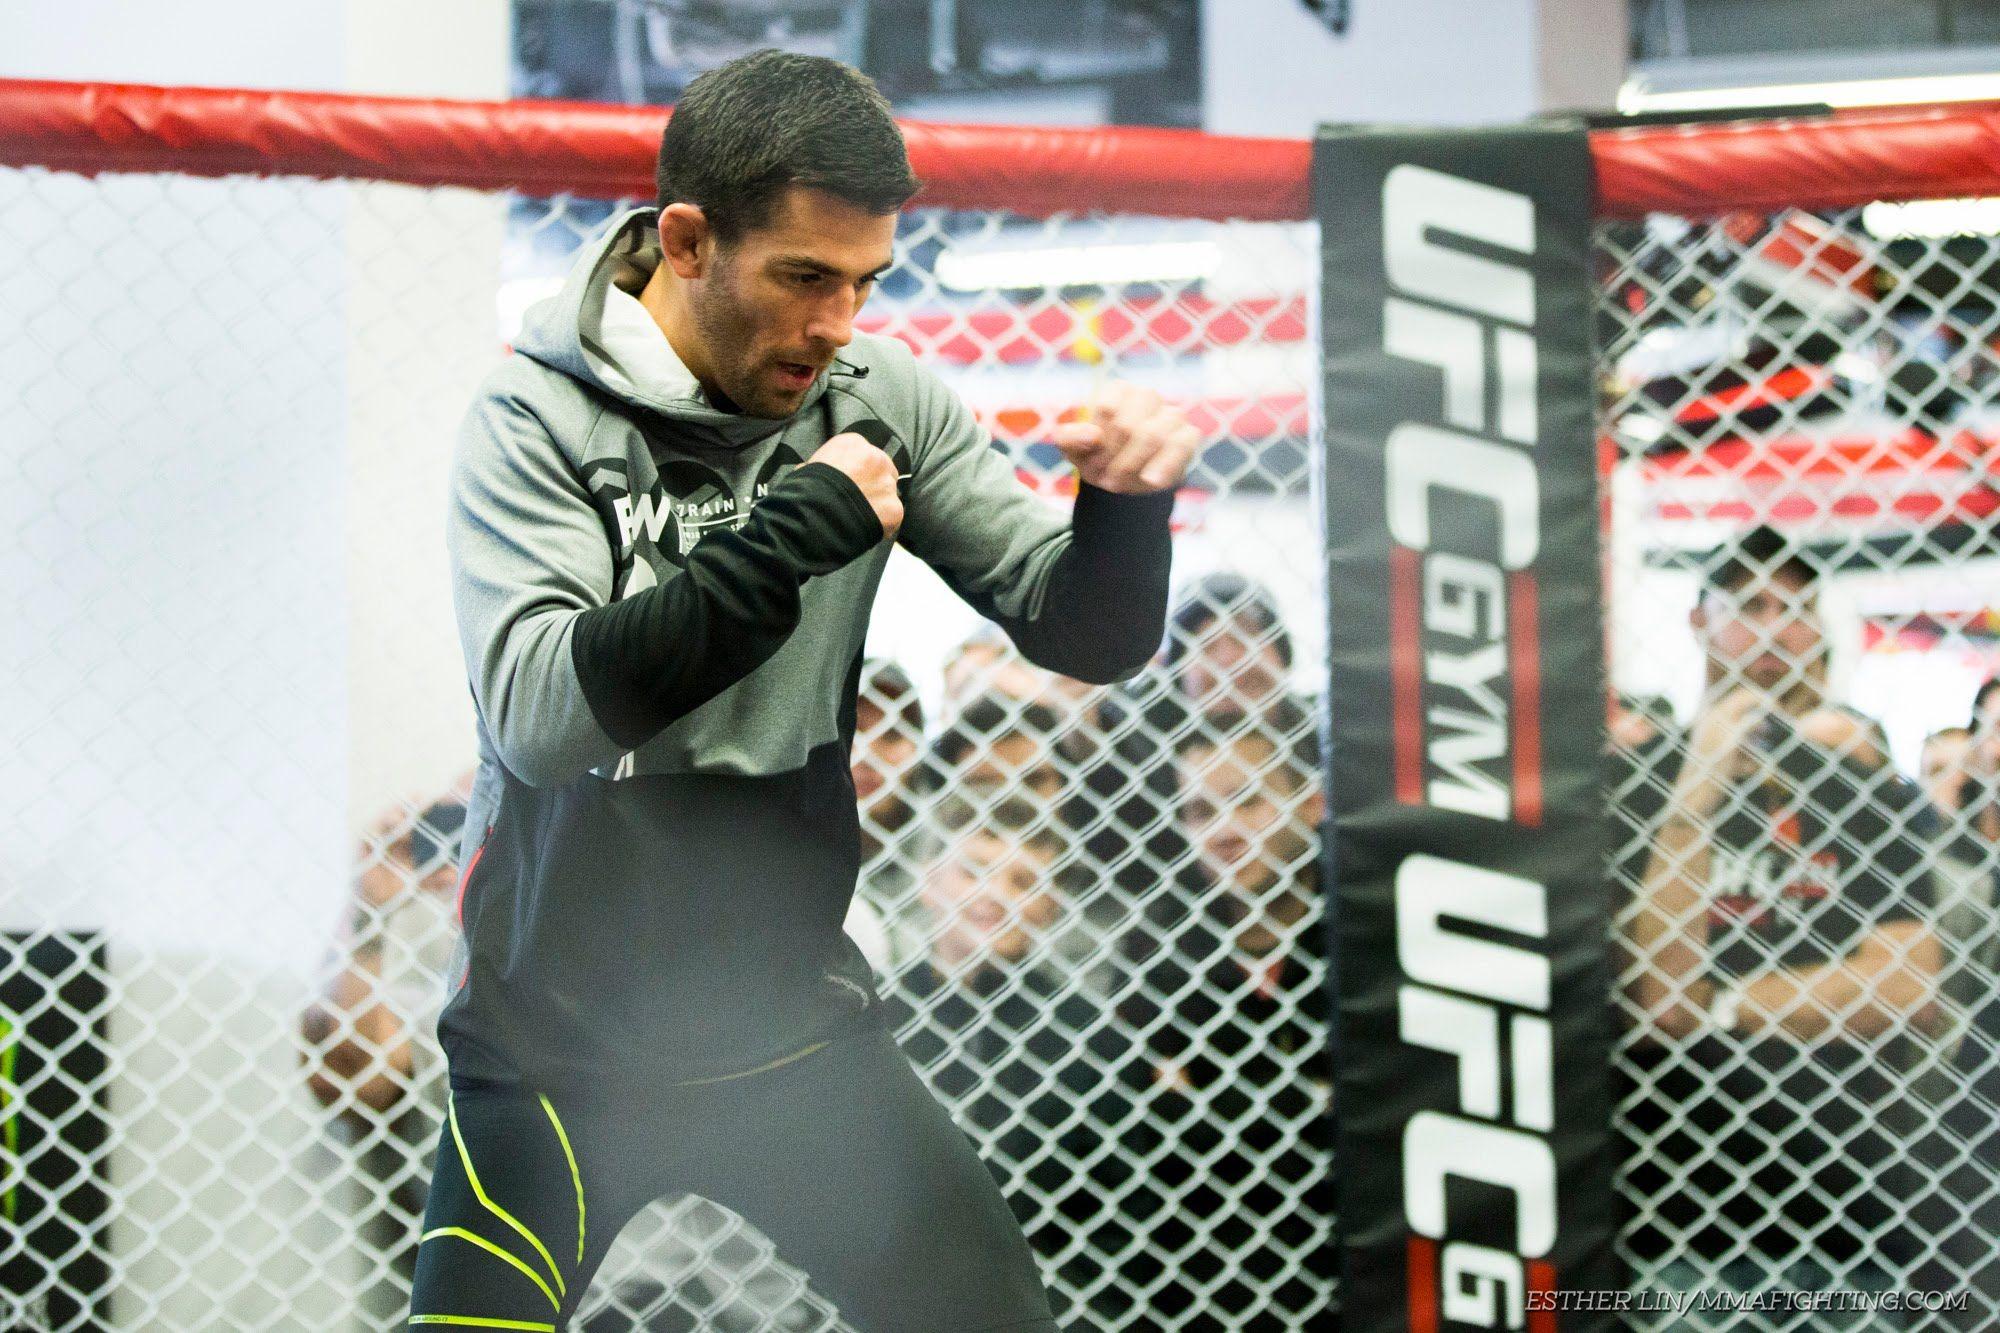 Ufc Fight Night 81 Dominick Cruz Workout Highlights Ufc Fight Night Dominick Cruz Best Ufc Fighter